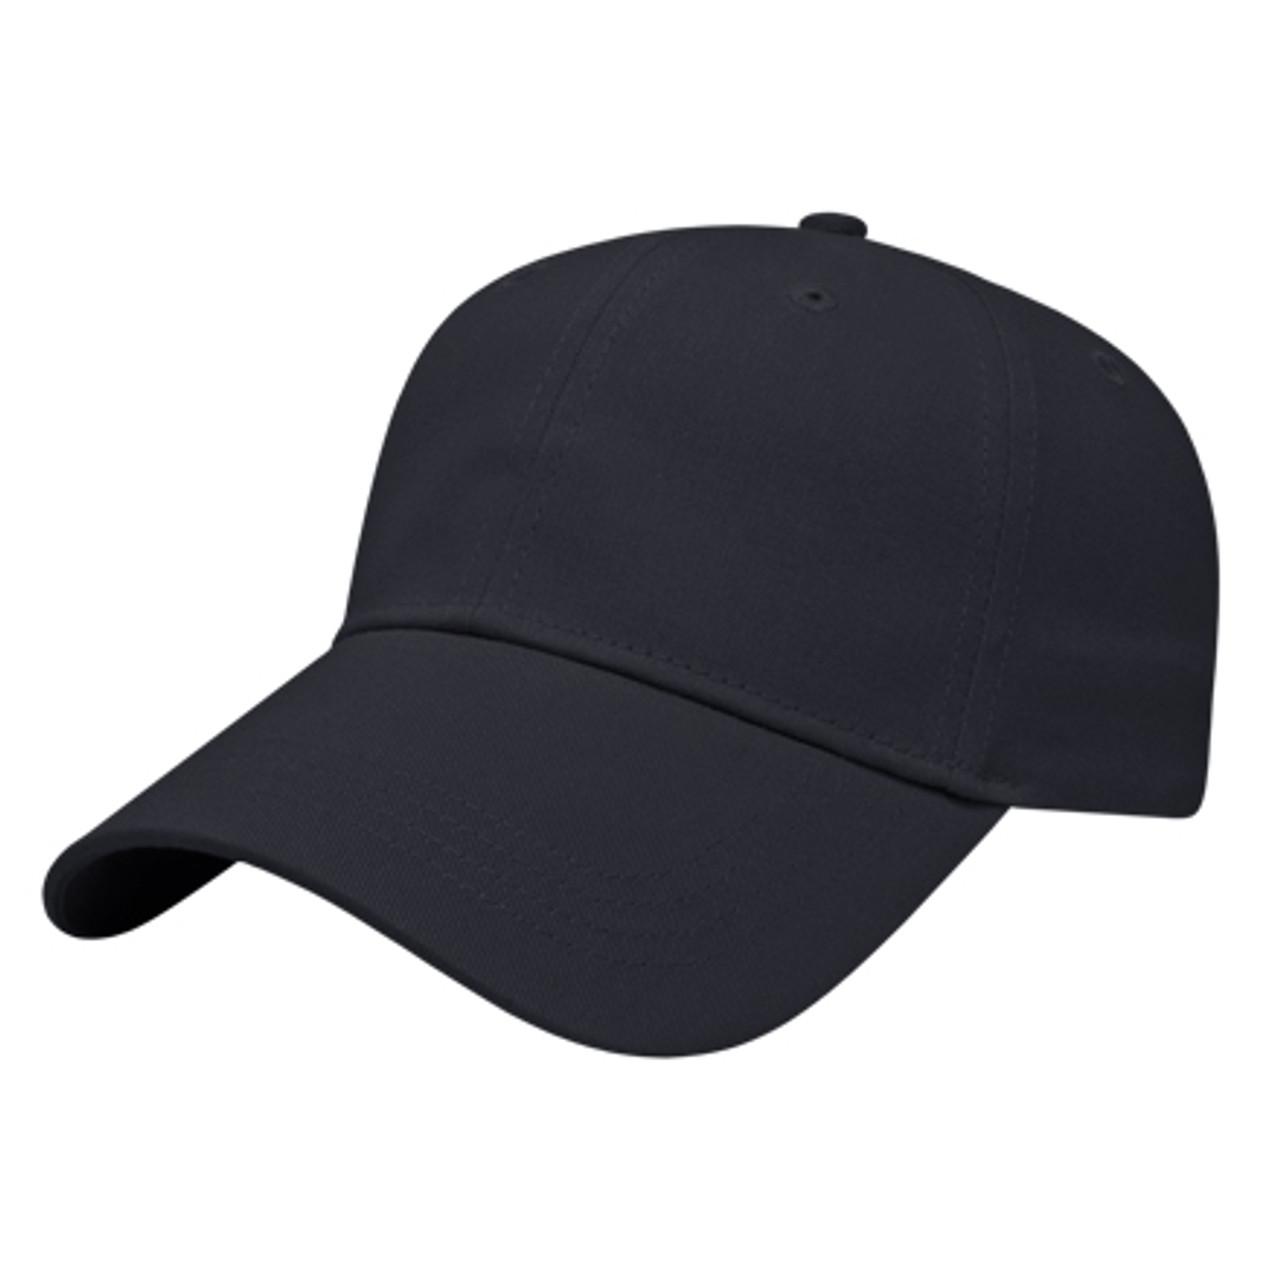 Promotional Low Profile Lightweight Cap